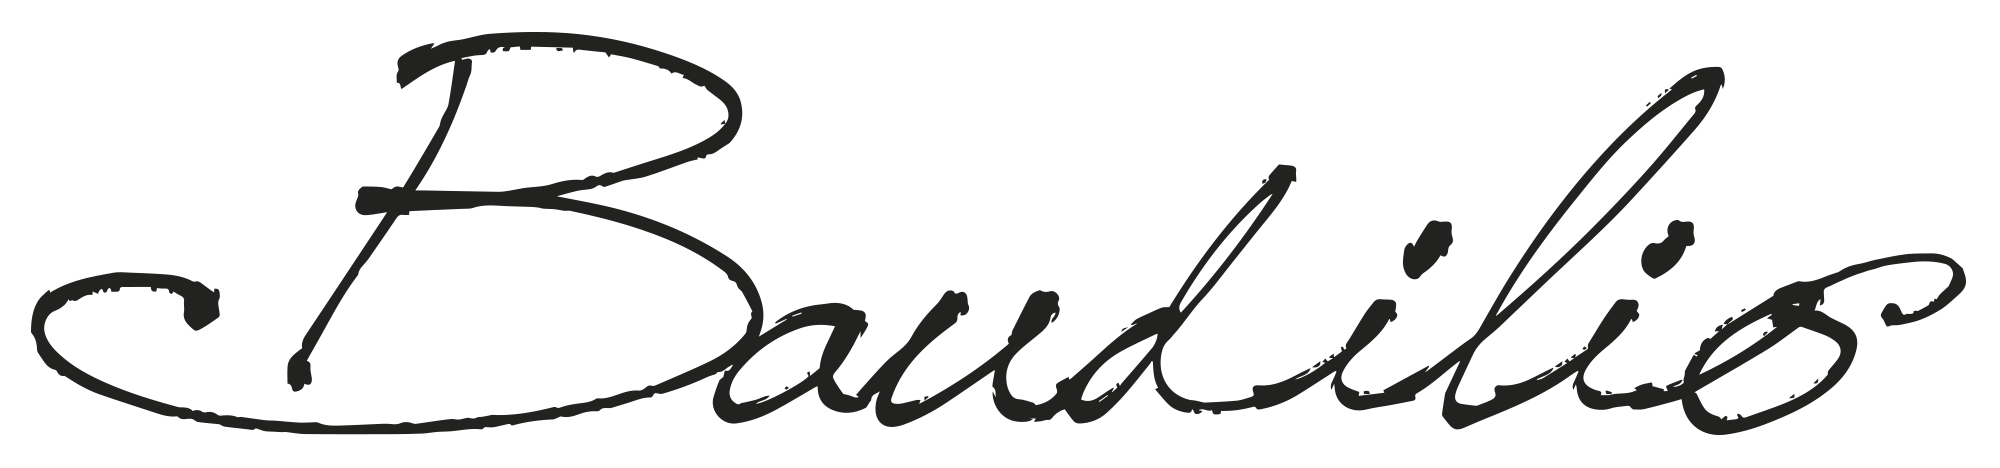 Baudilio logo